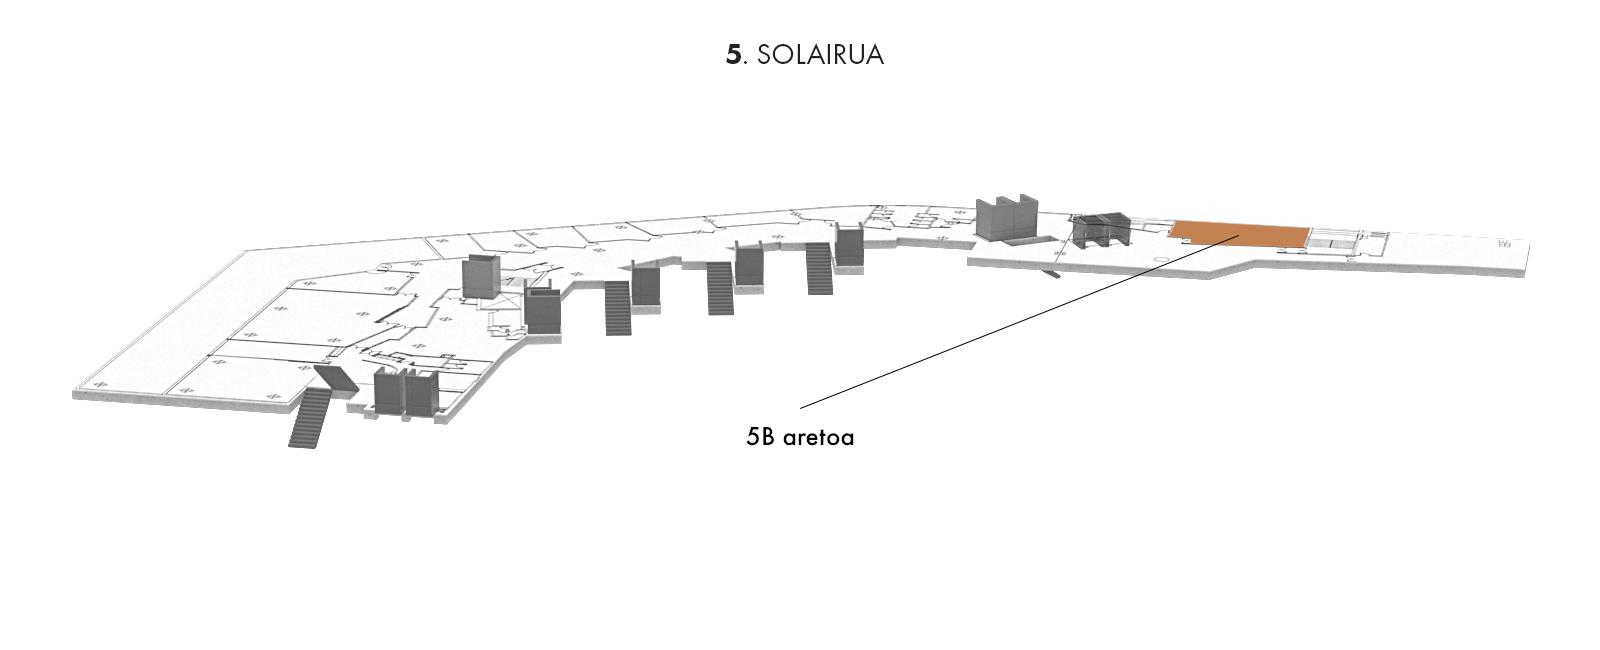 5B aretoa, 5. solairua | Palacio Euskalduna Jauregia